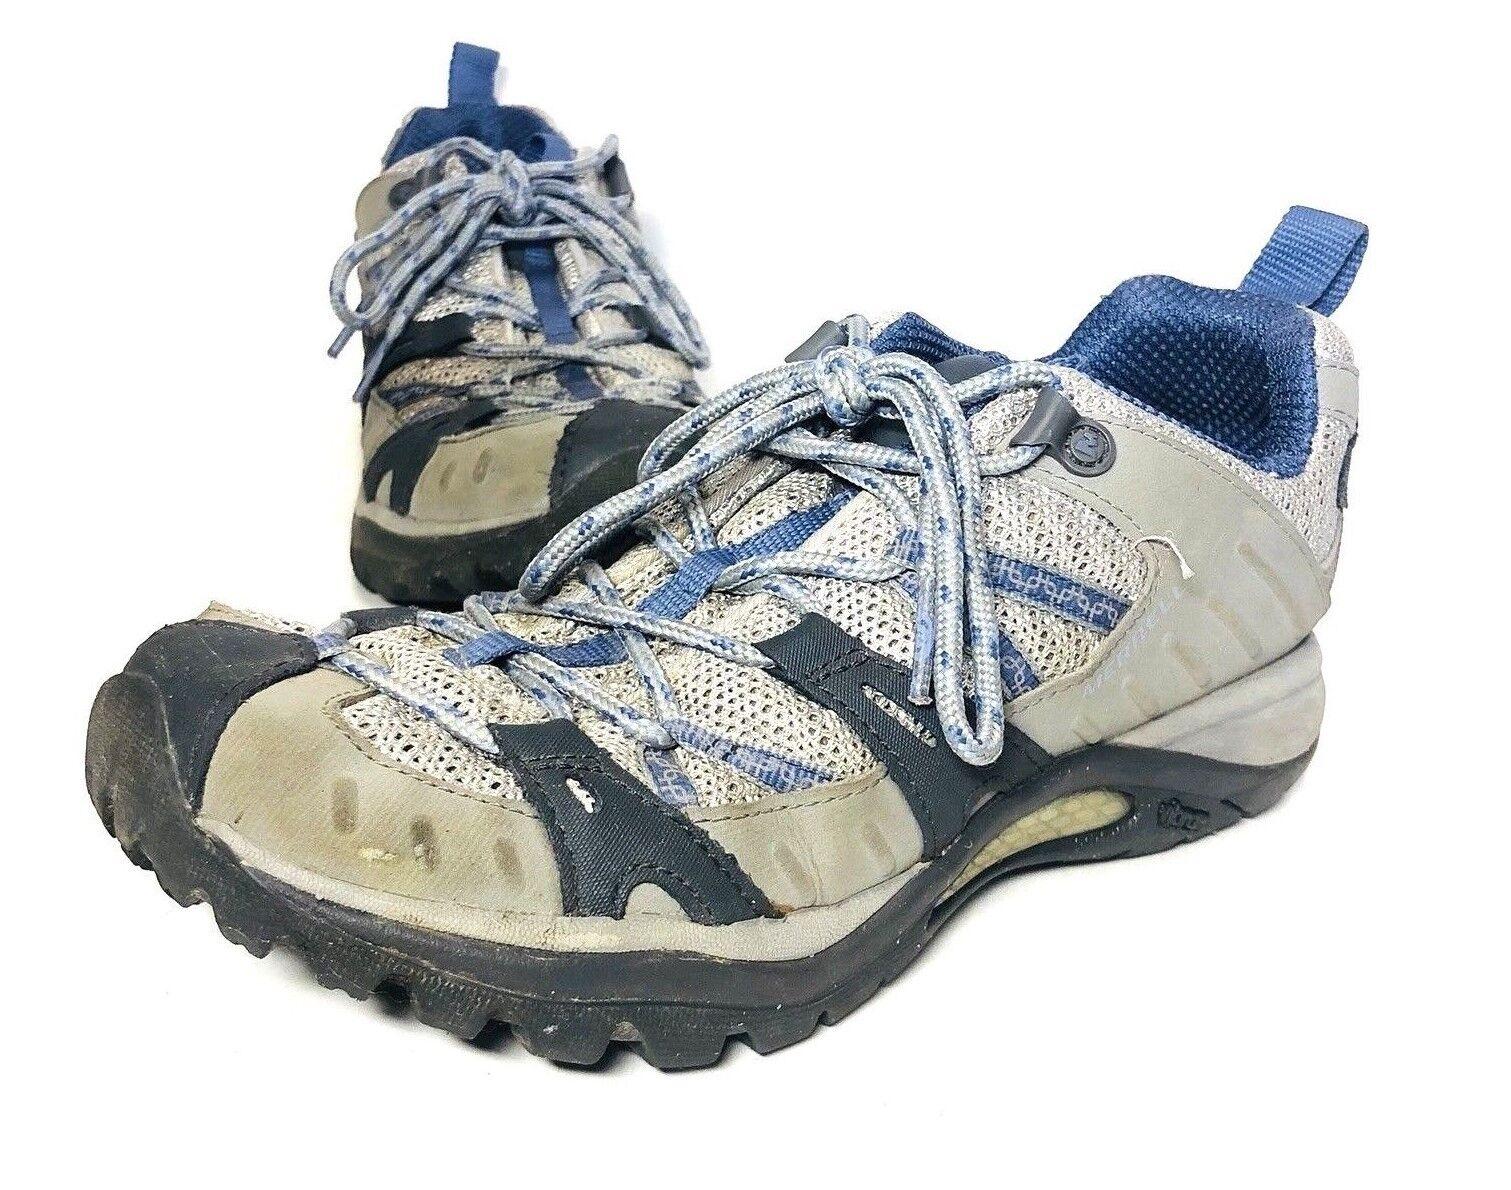 Merrell Siren Port Grey bluee Running Trial Hiking shoes Vibram Women's Size 7